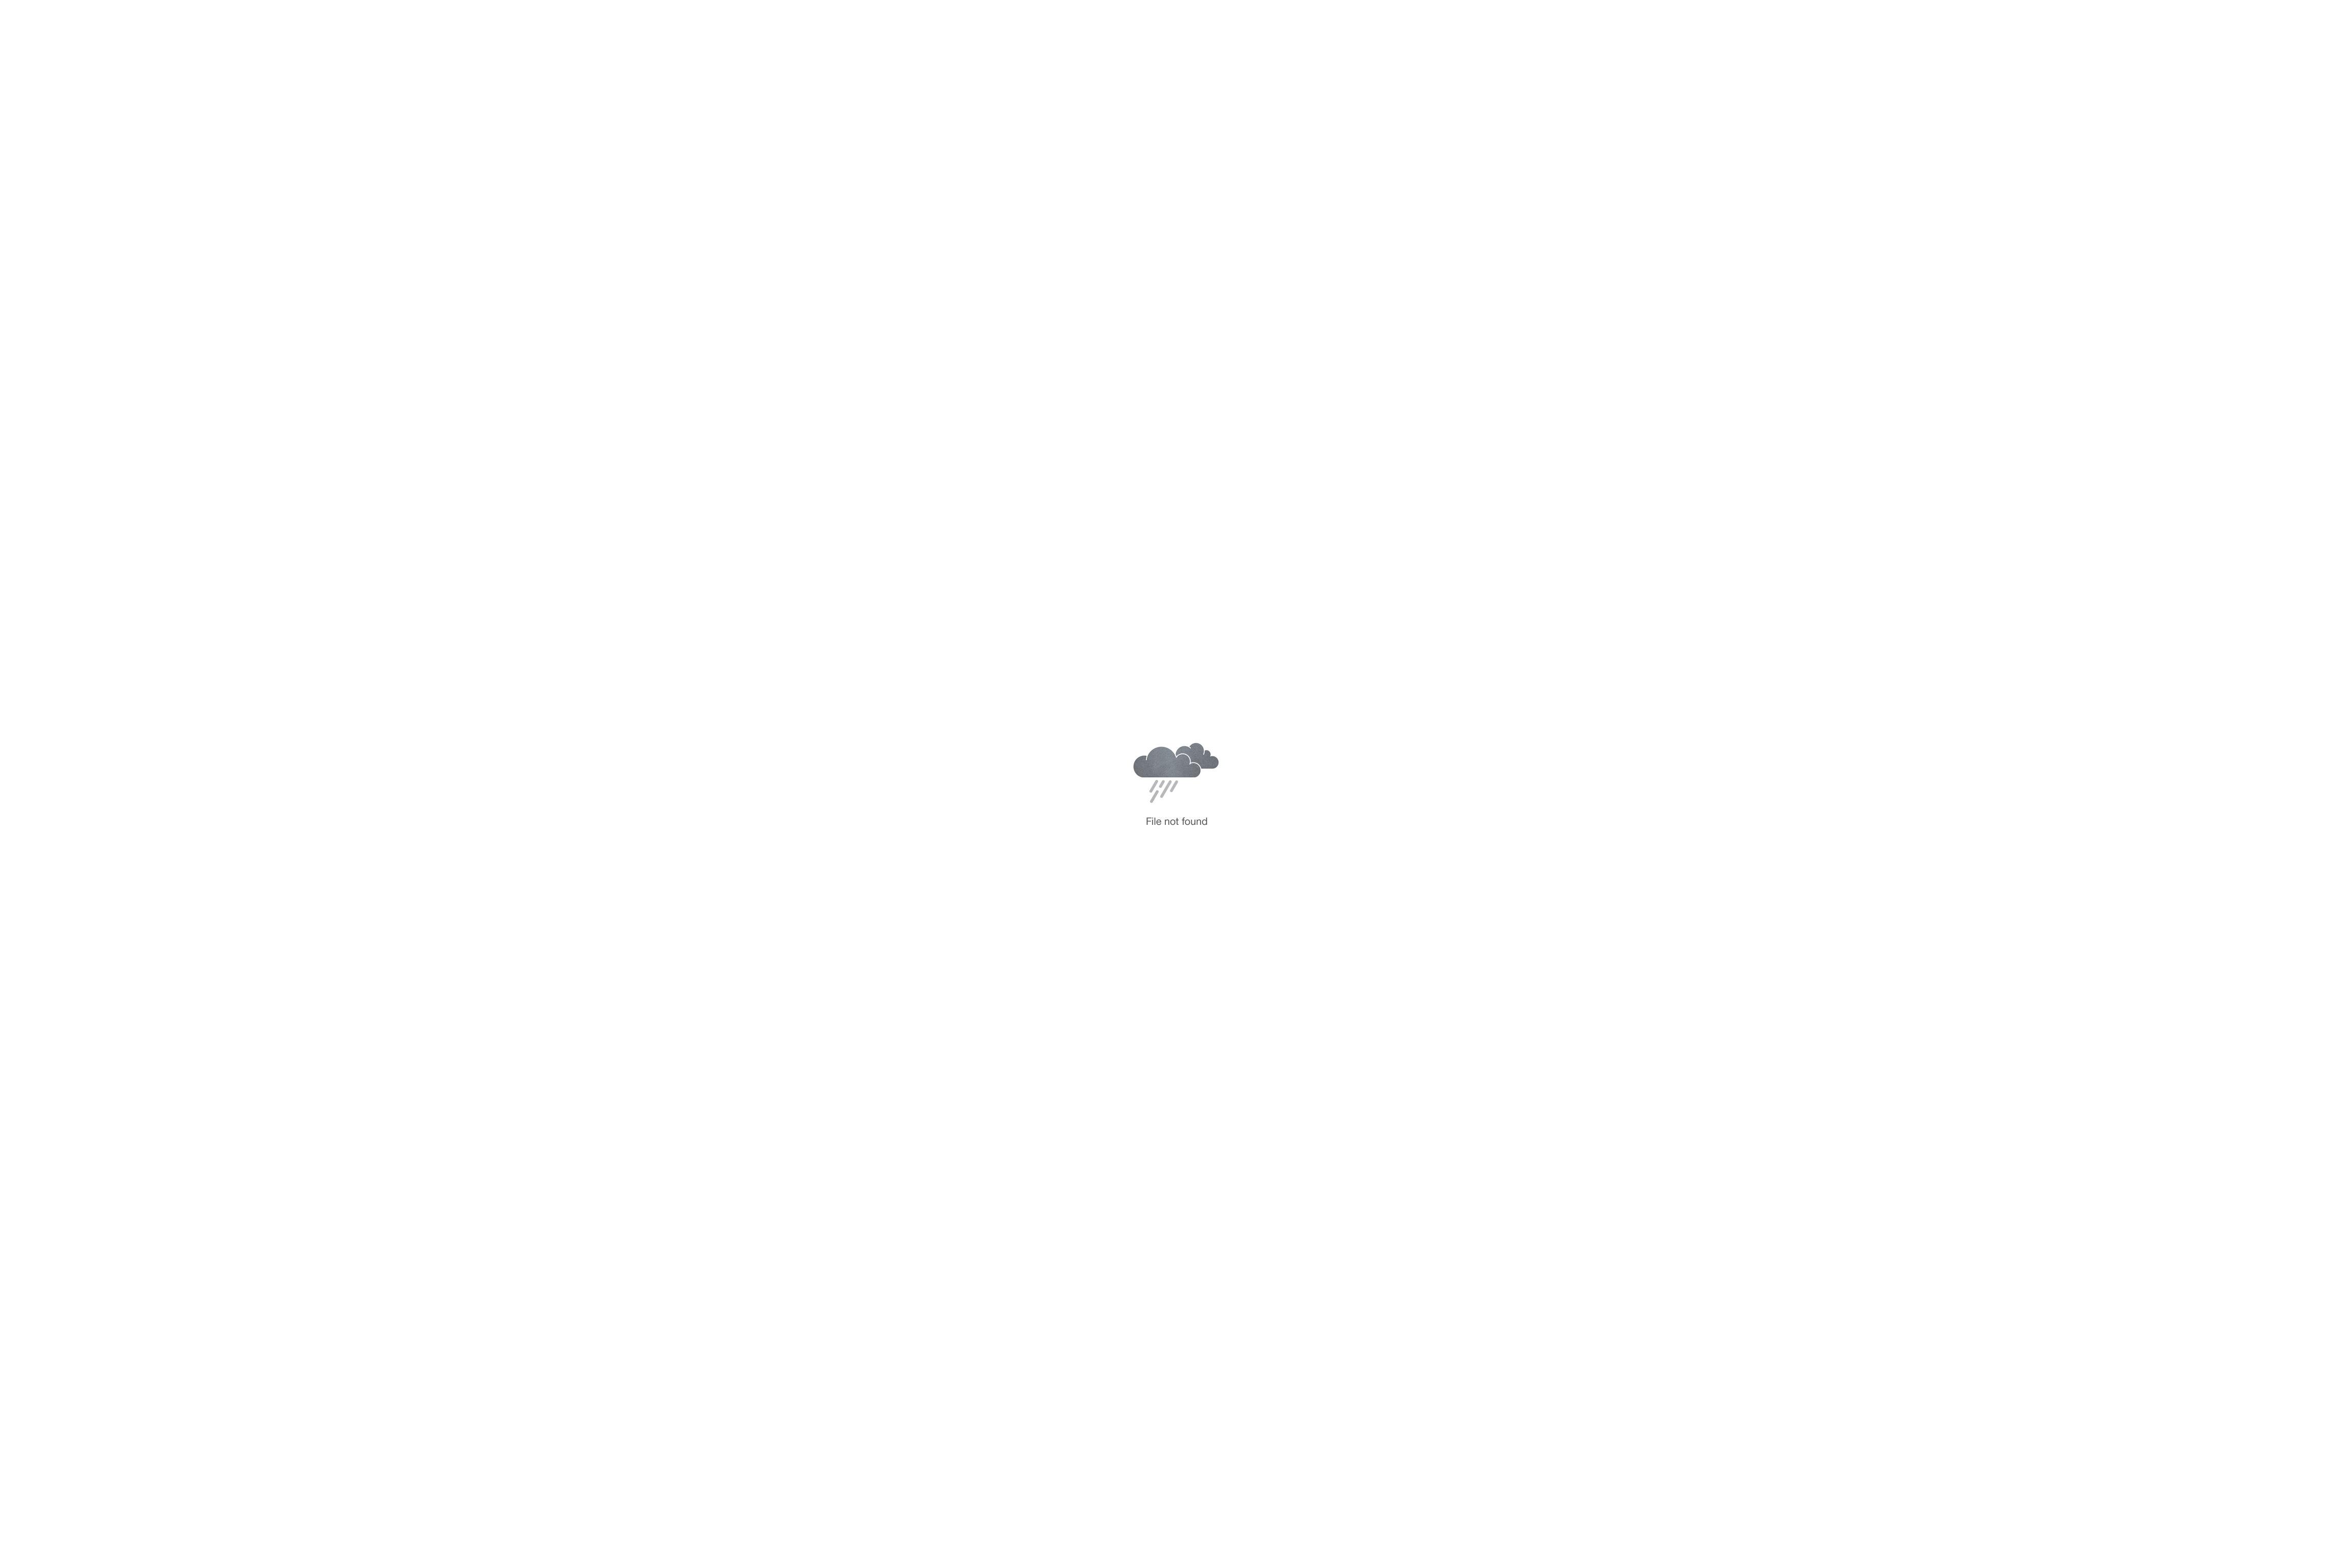 Association sportive-Lycée Romain Rolland Goussainville-Rugby-Sponsorise-me-image-2